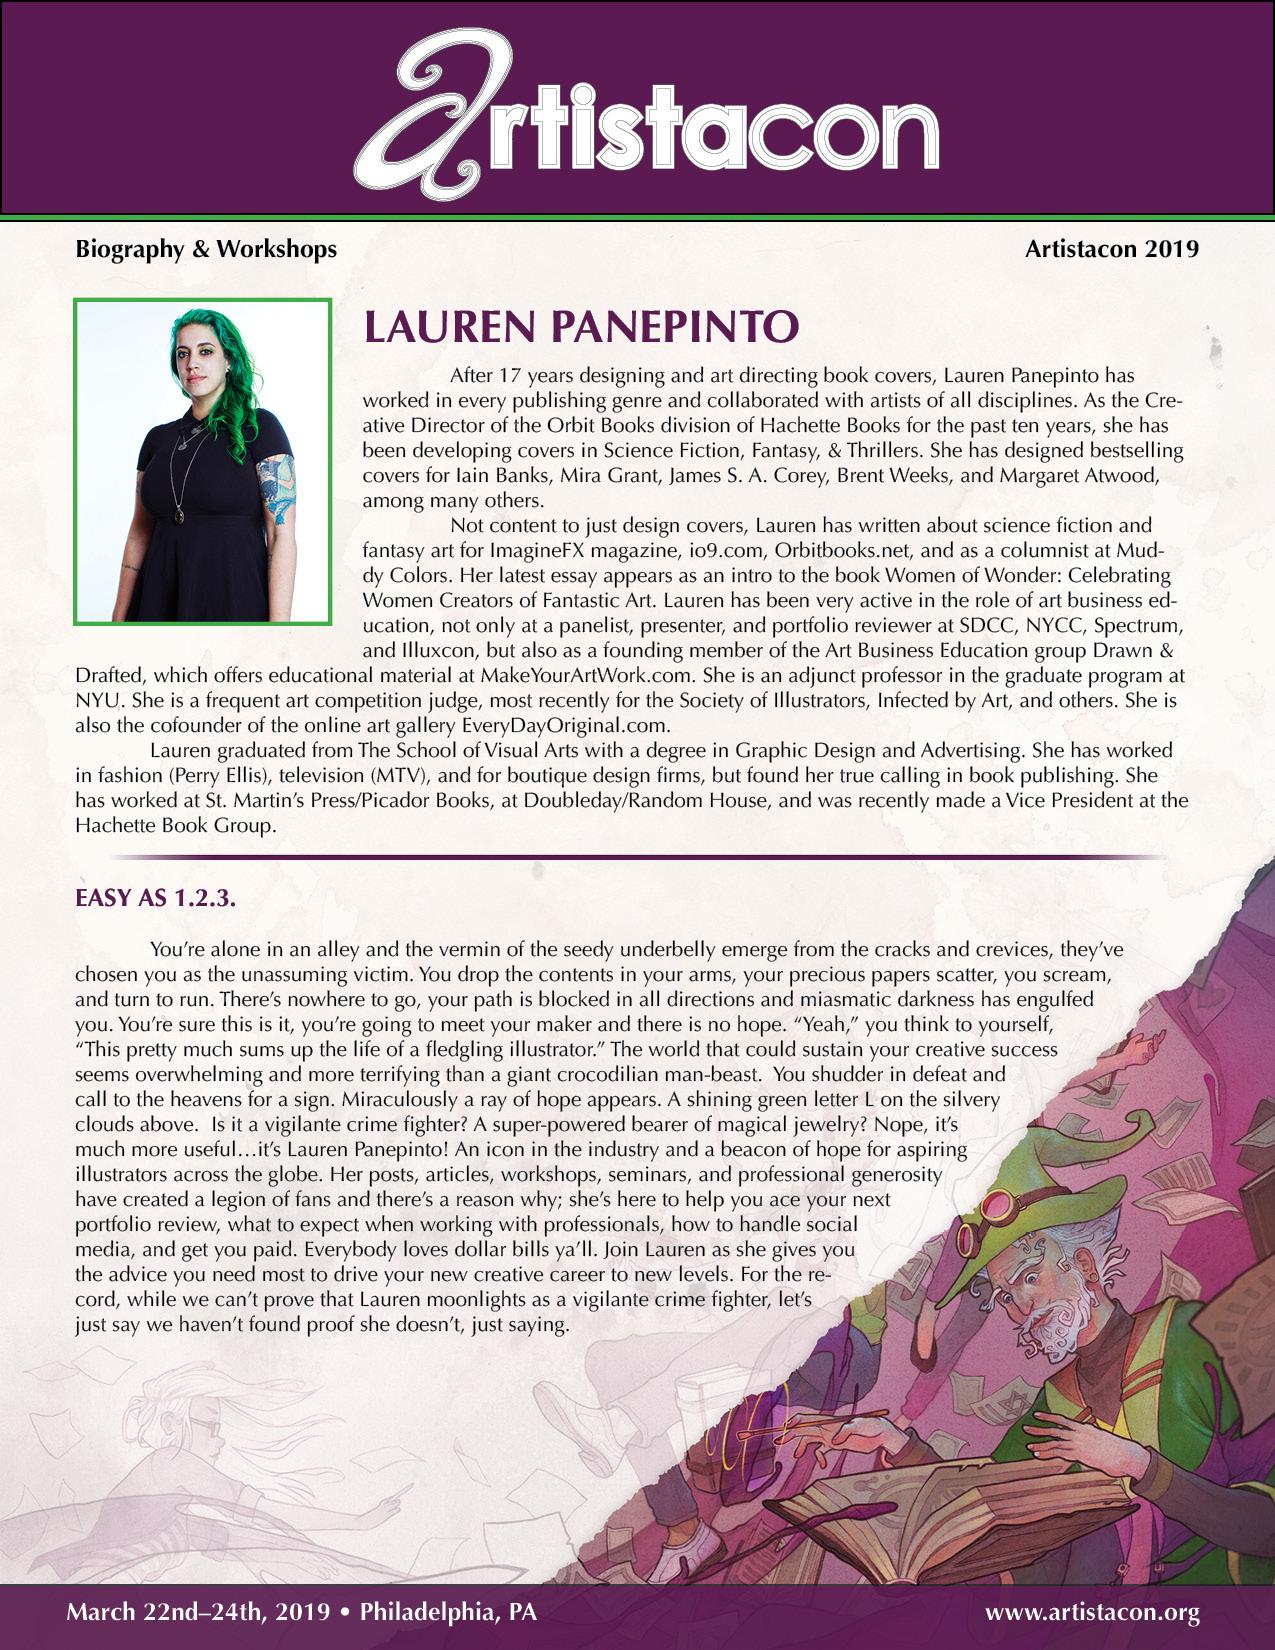 bioPage_Template_Artistacon2019_Panepinto_002 copy.jpg